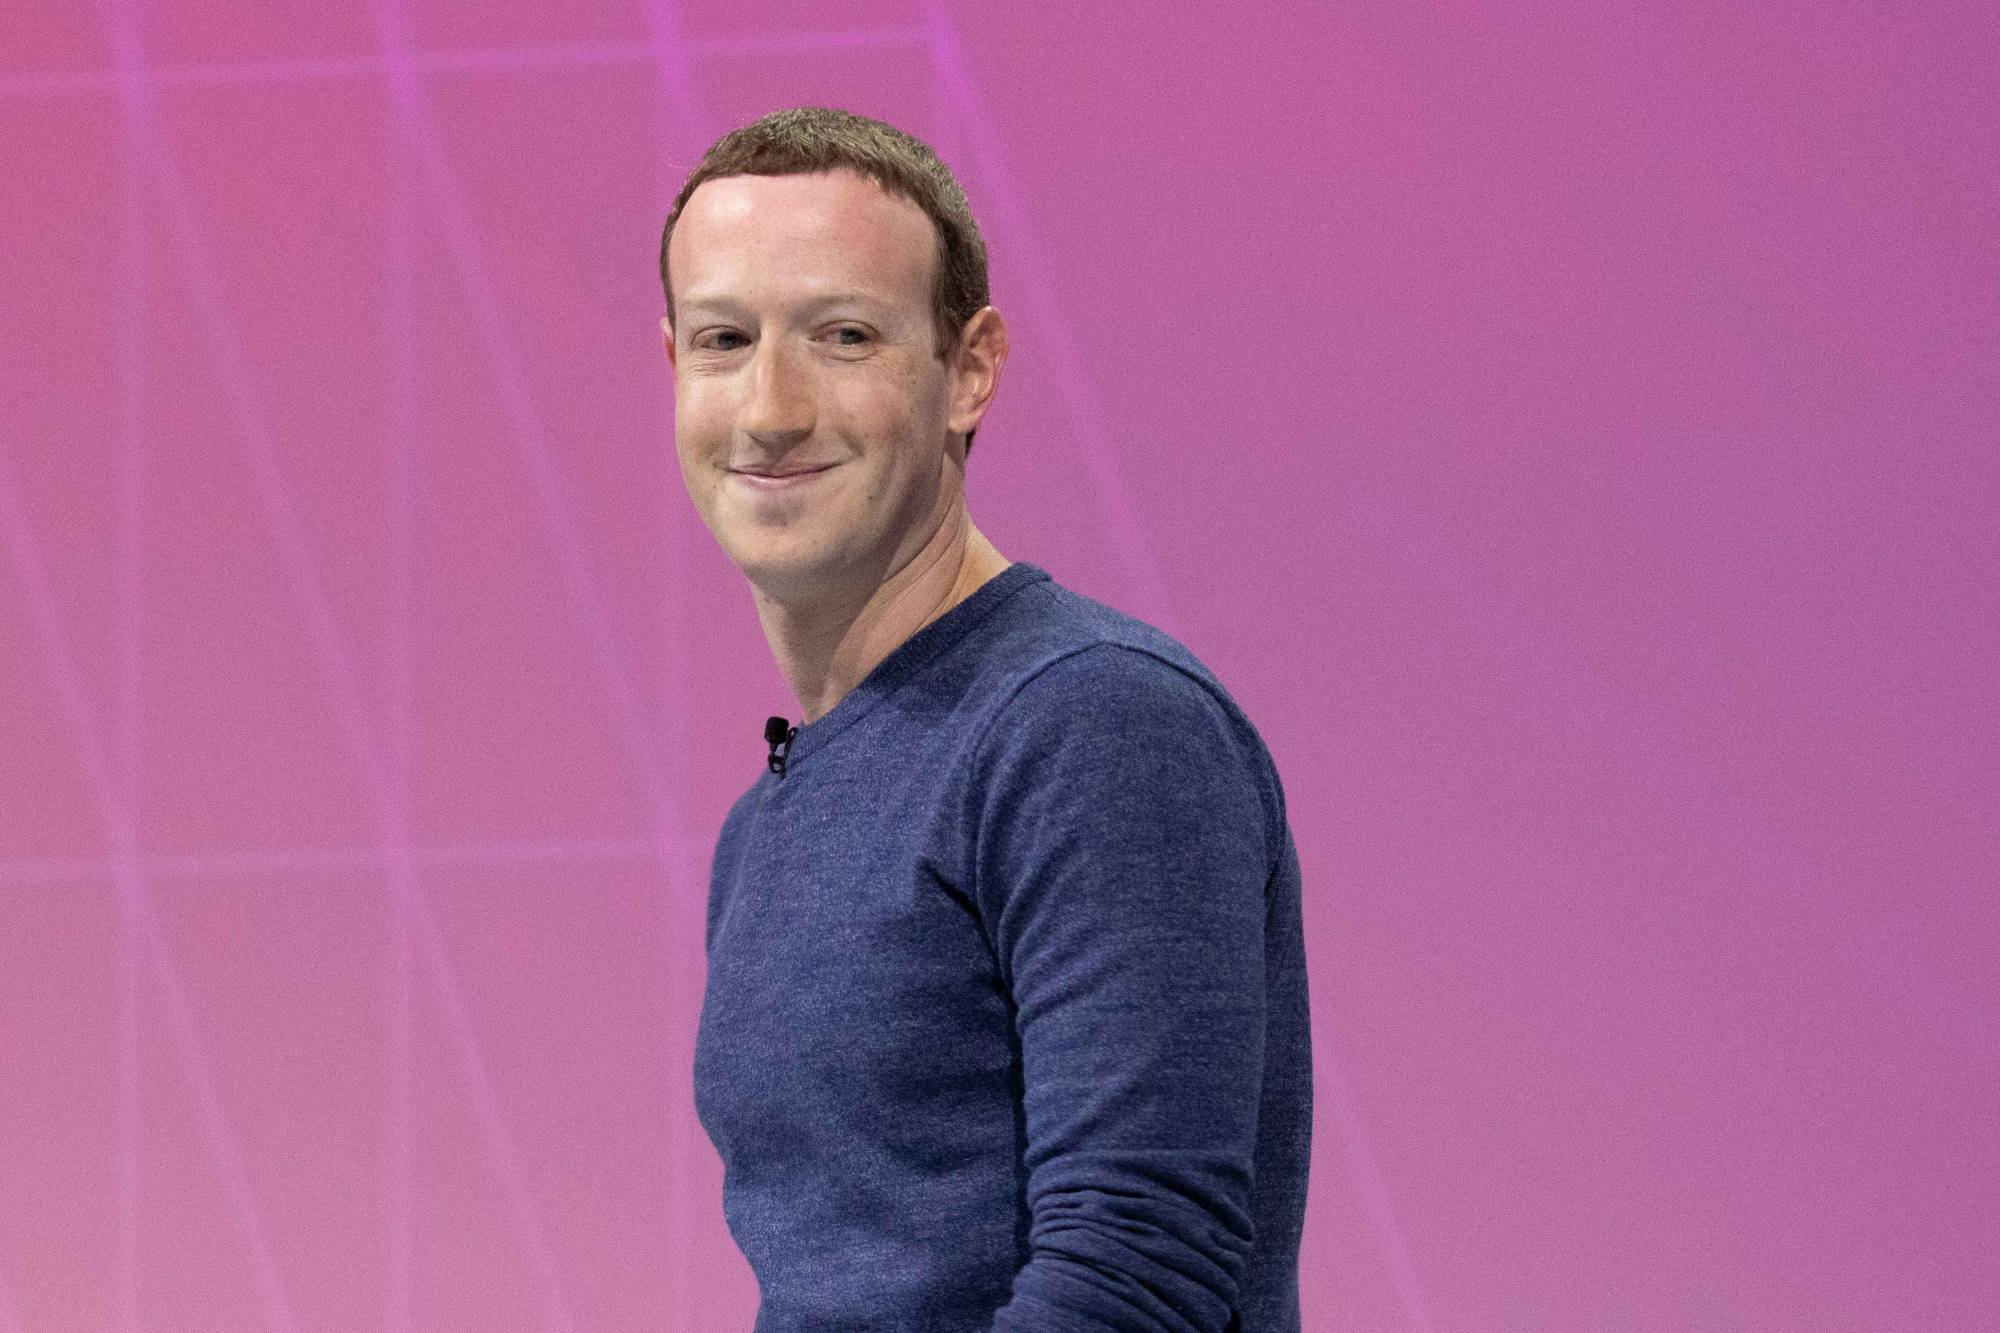 facebook ceo mark zuckerberg at Salon Viva Technology 2018